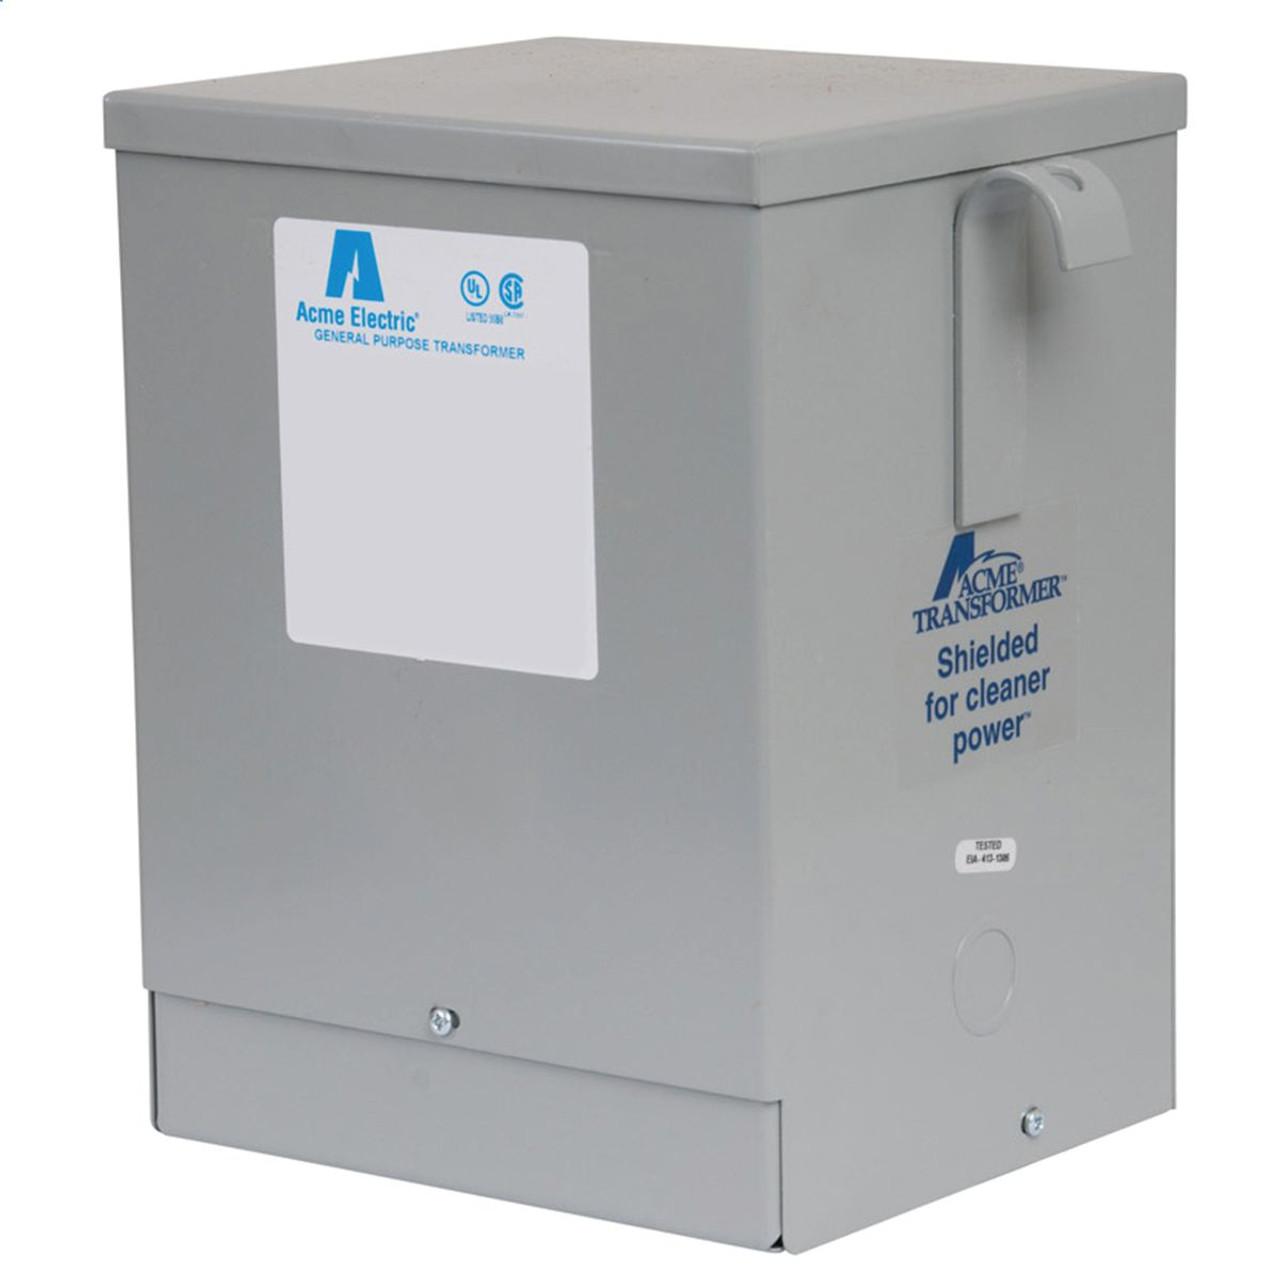 Representative image of an Acme Buck-Boost transformer